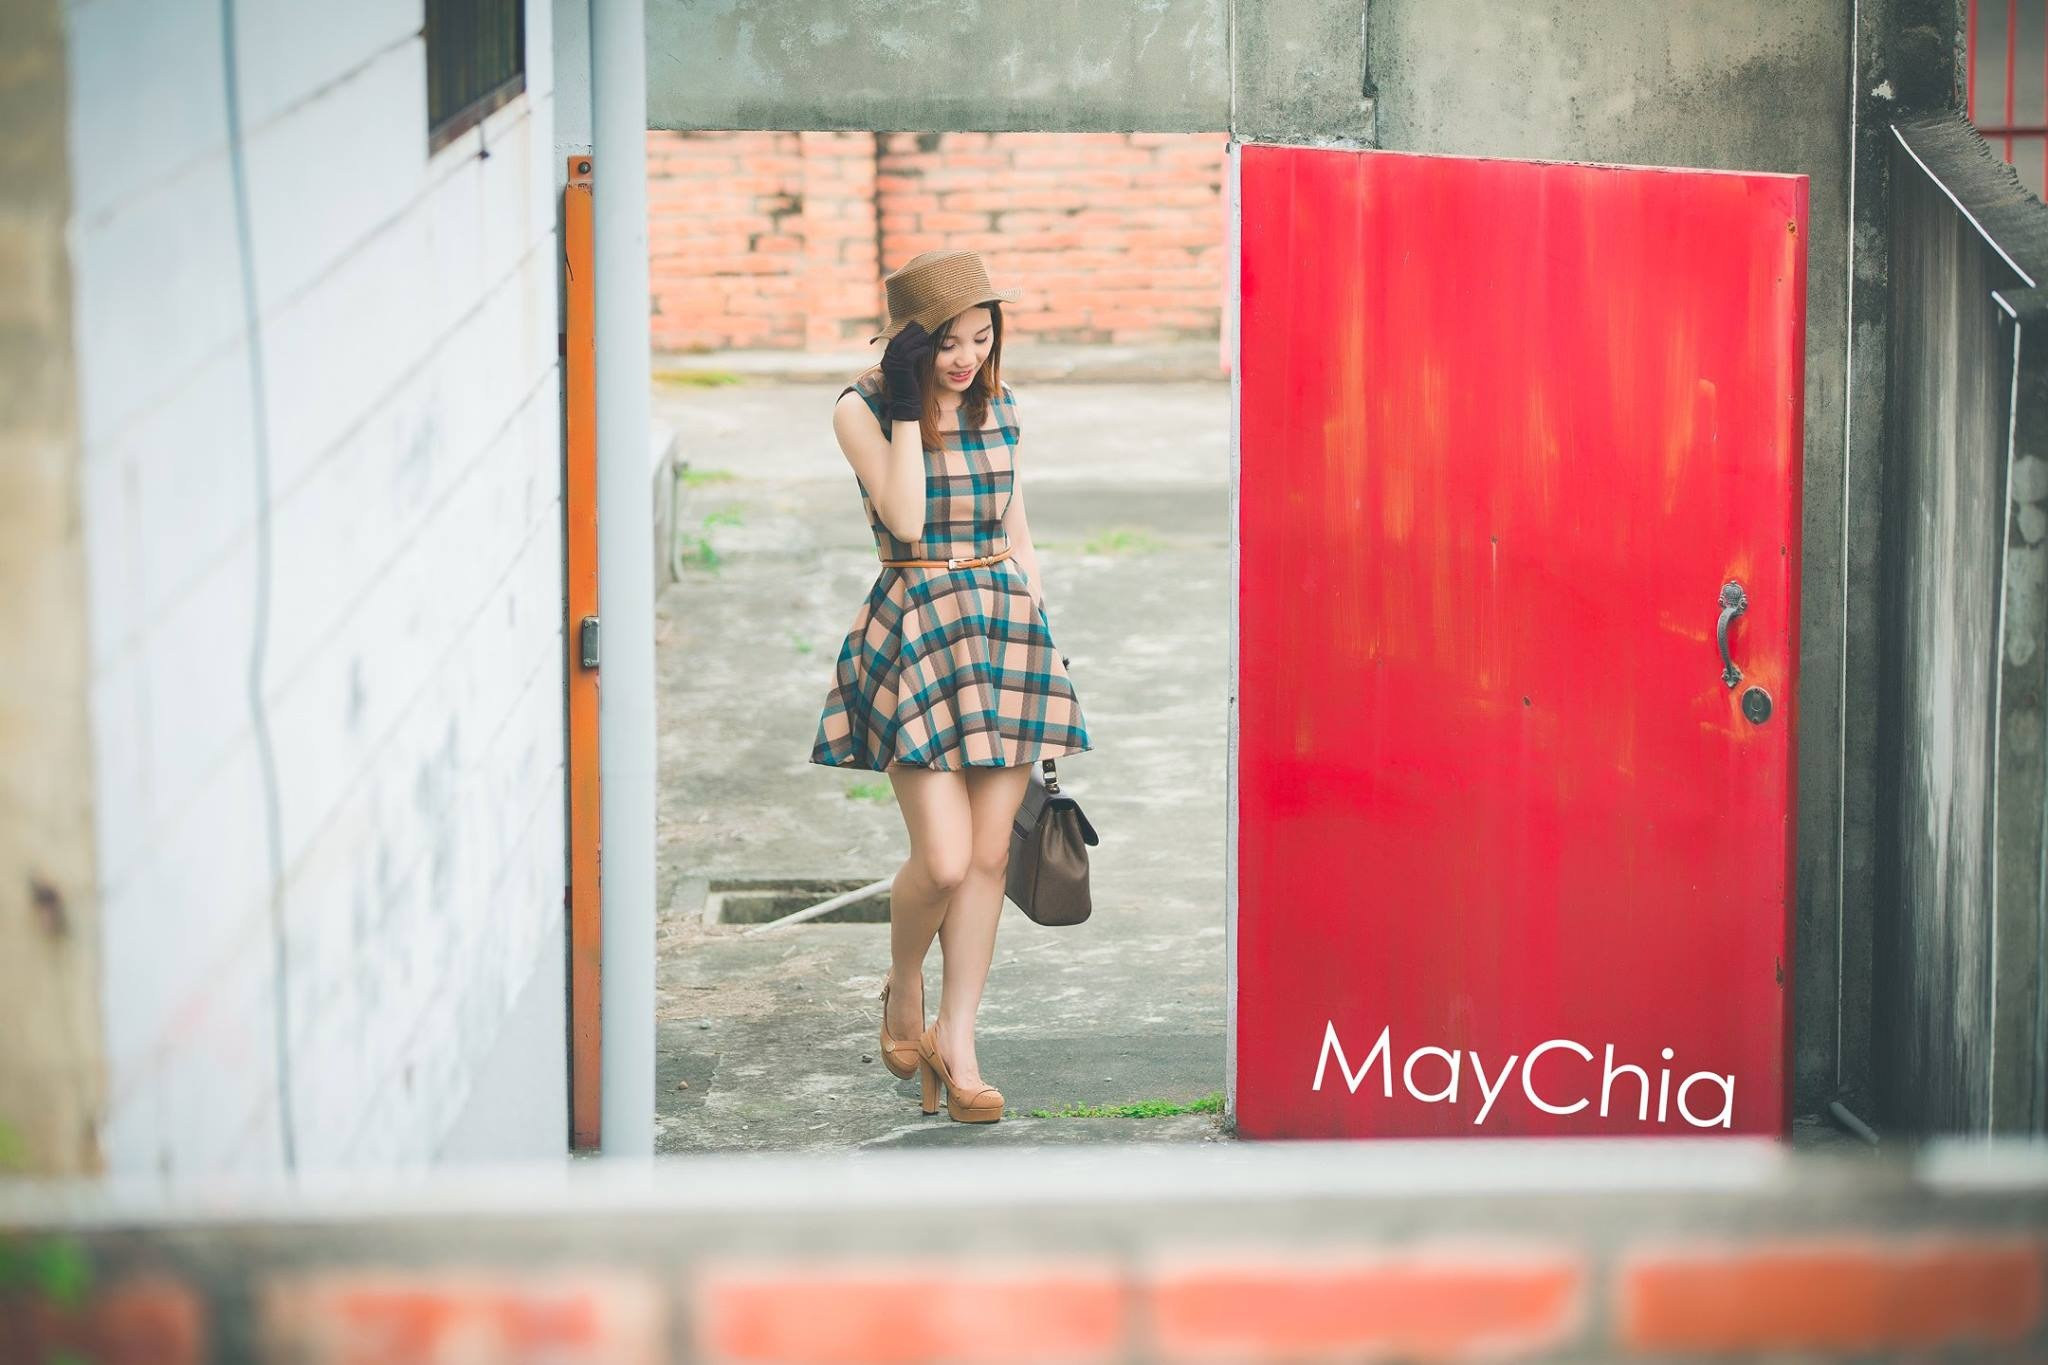 GIRL by Chao-chin Yang